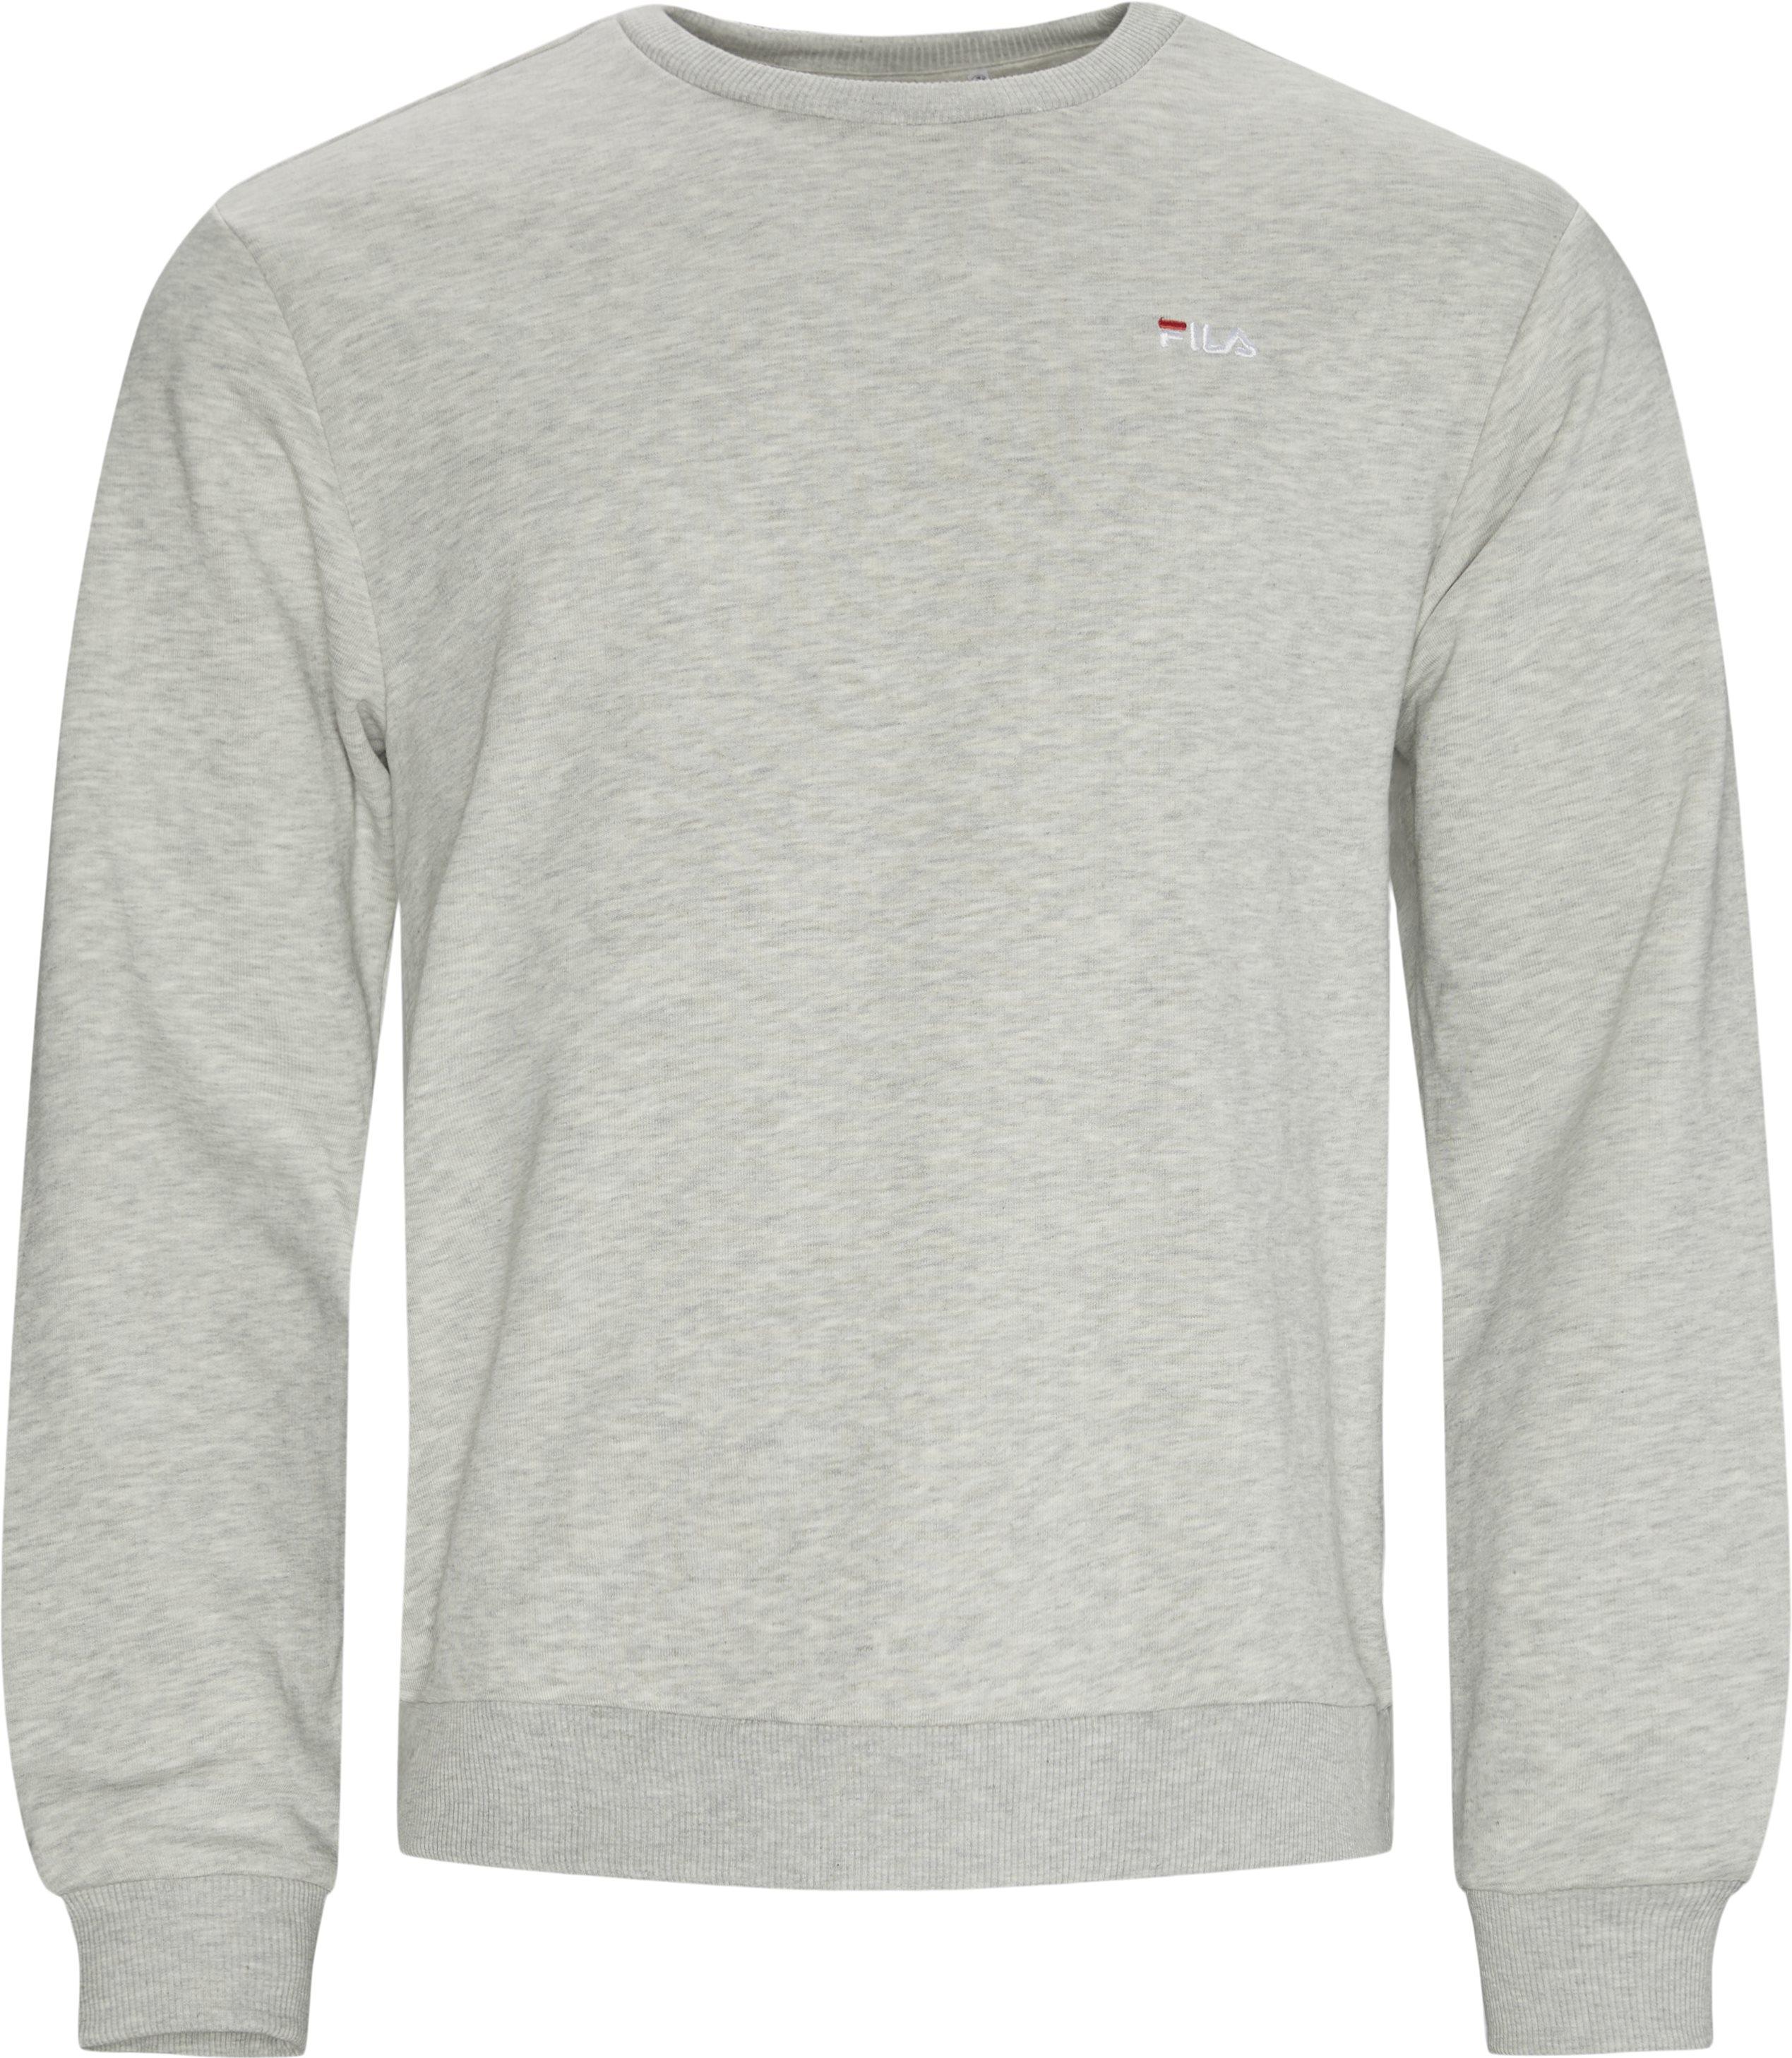 Efim Crewneck Sweatshirt - Sweatshirts - Regular fit - Grå